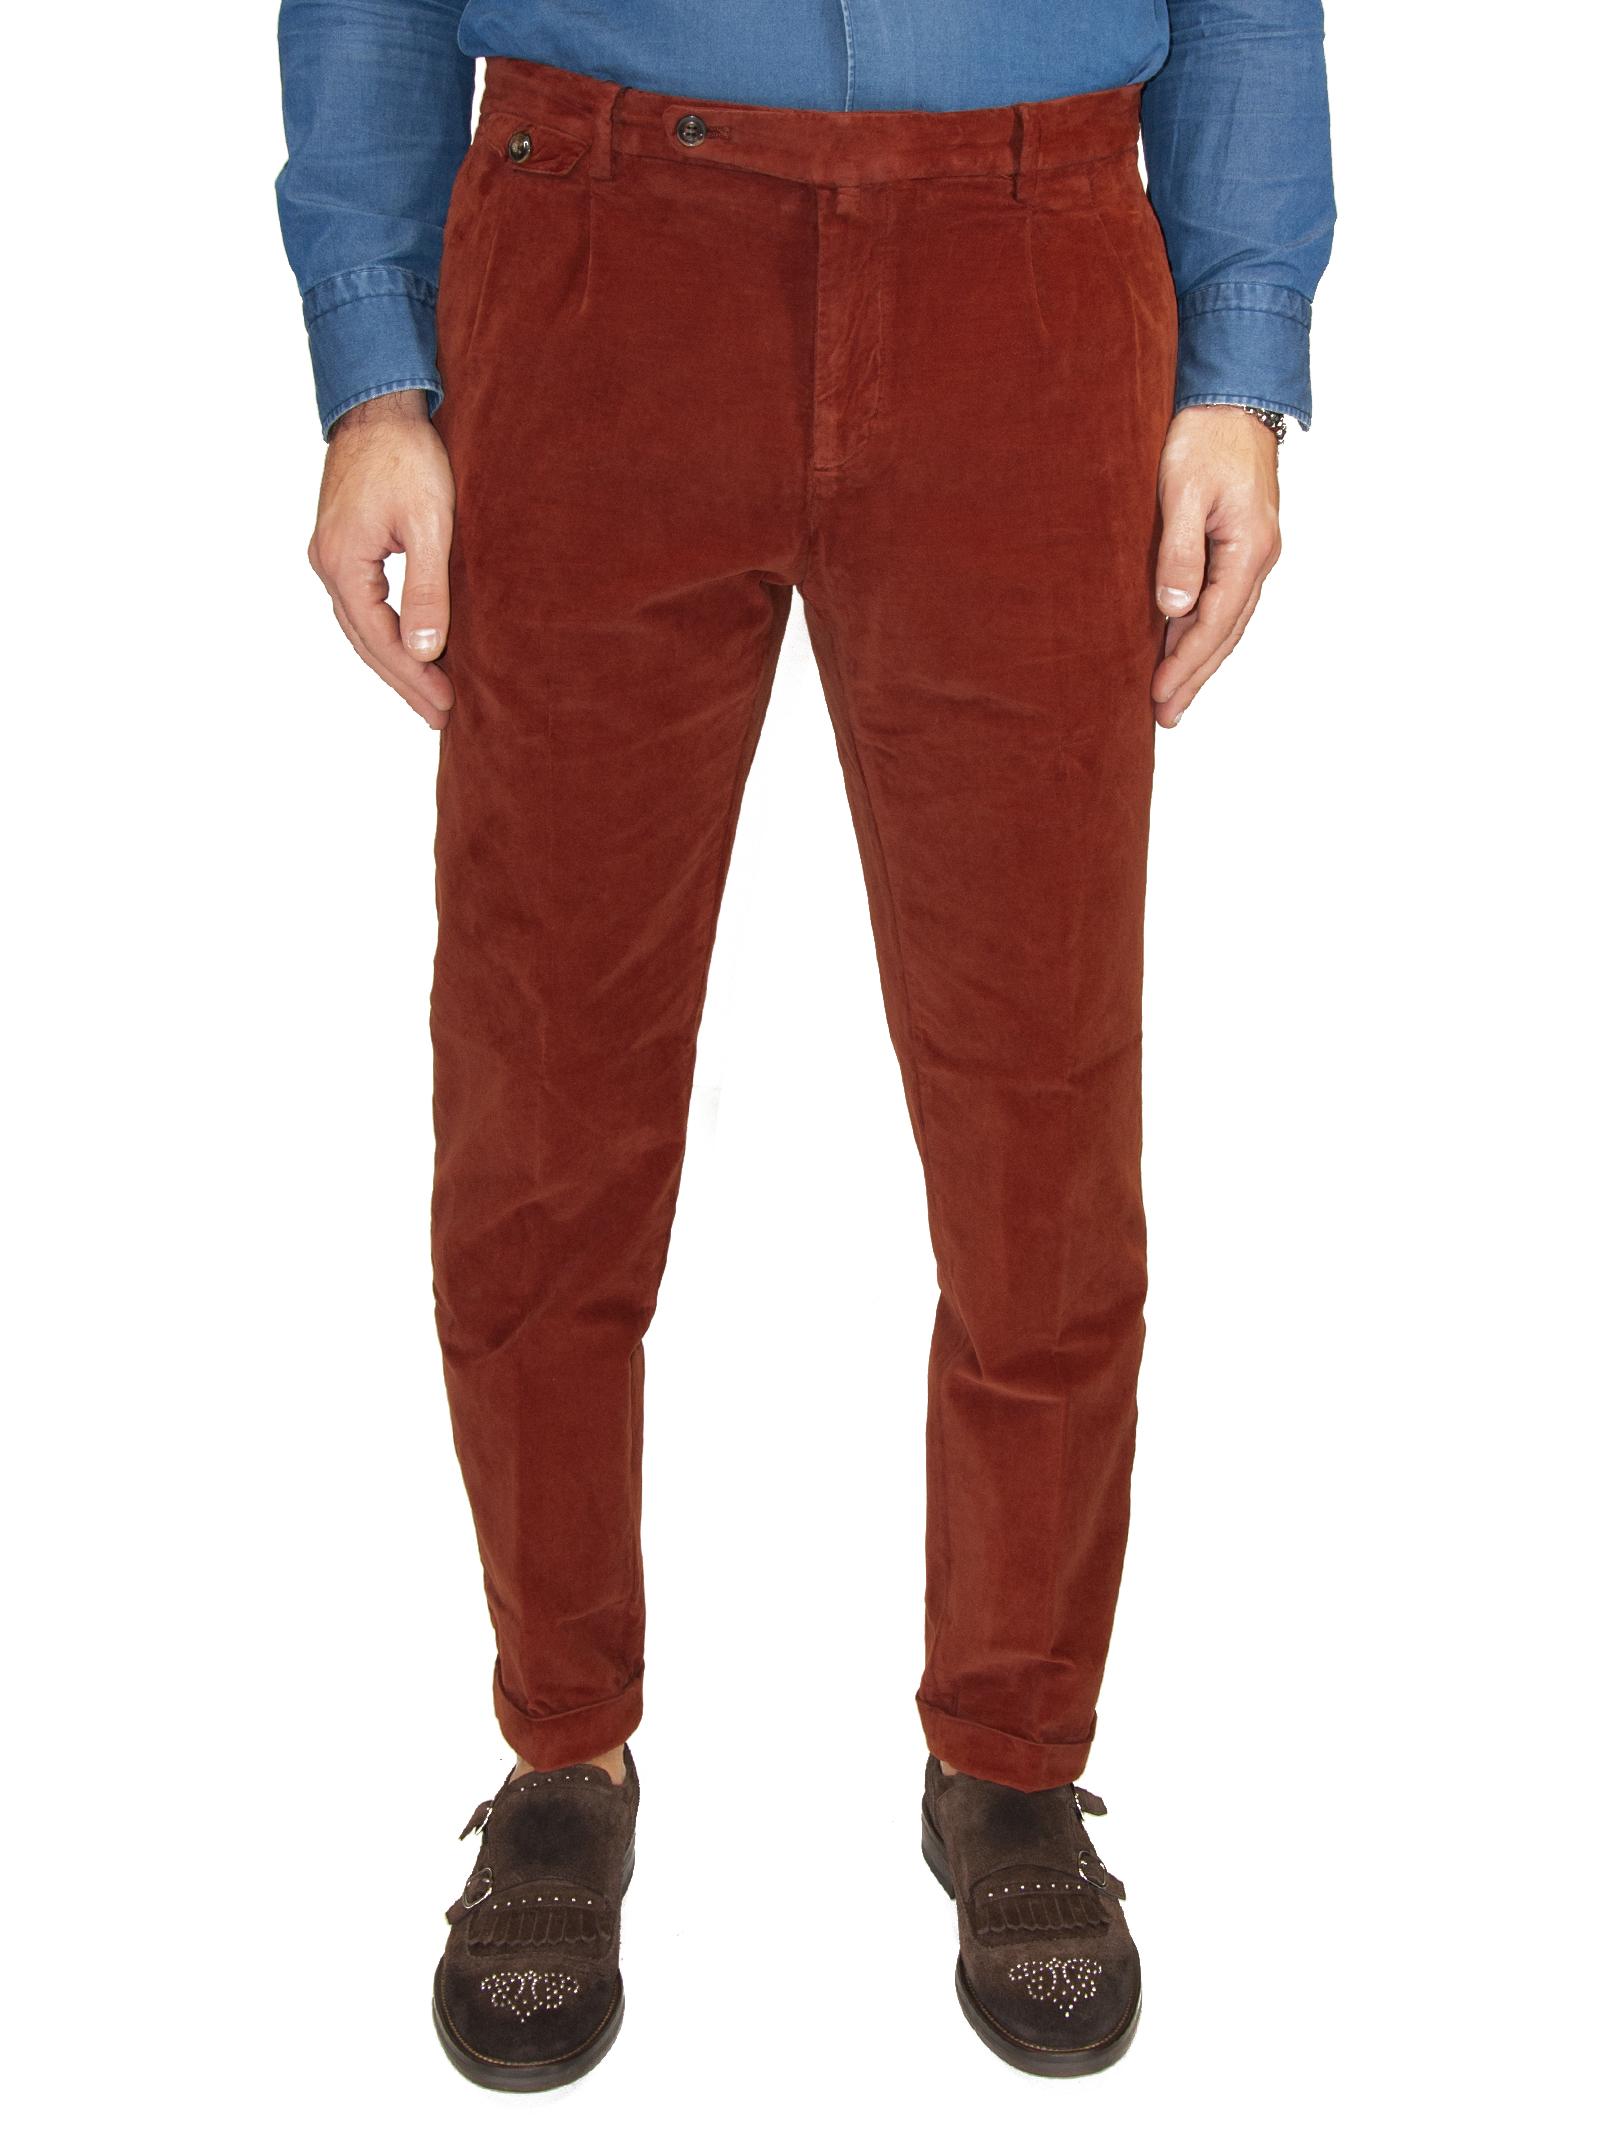 Pantalone Briglia BRIGLIA | 9 | BG02 4205468